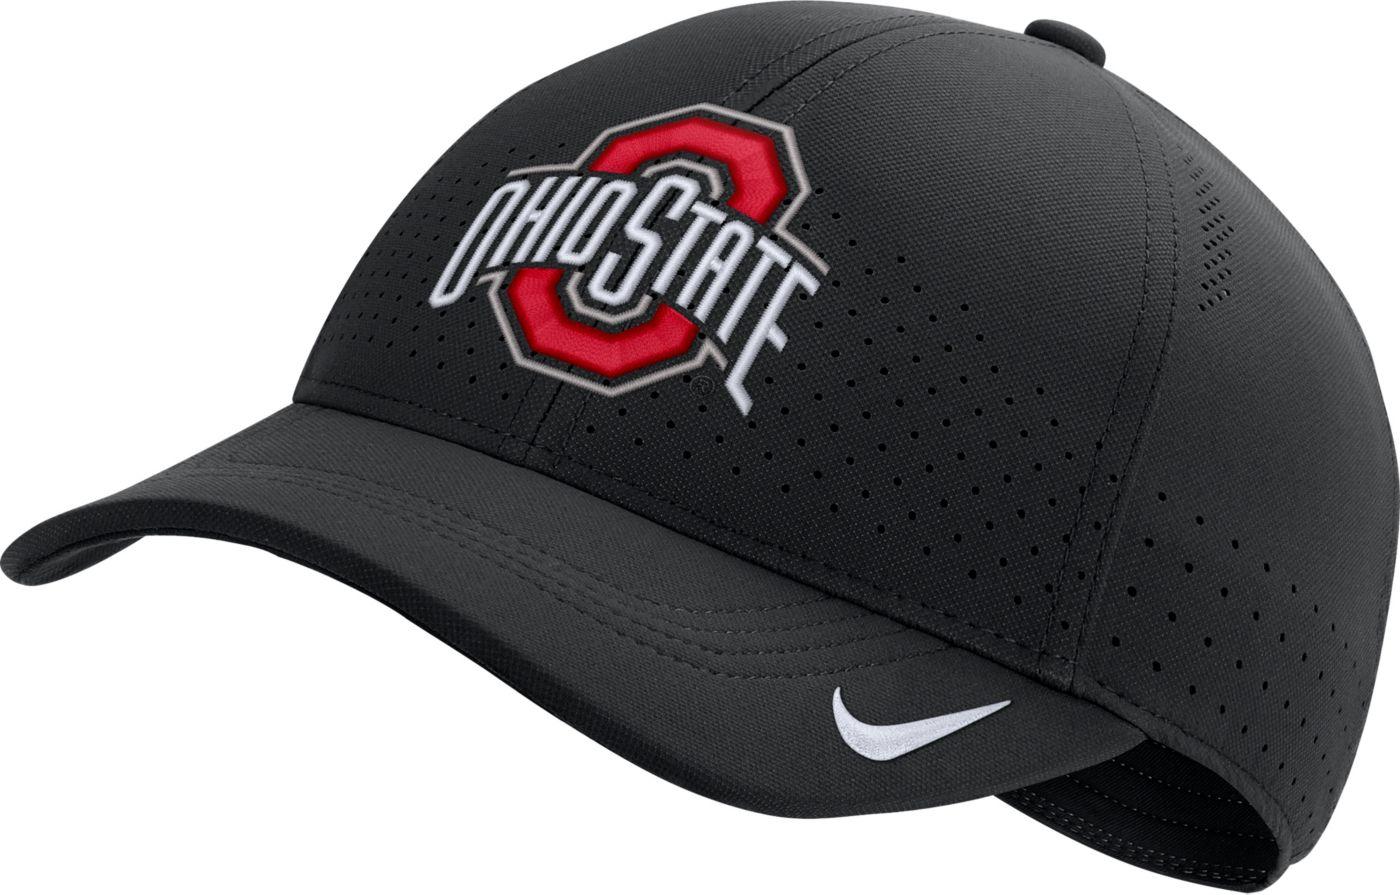 Nike Men's Ohio State Buckeyes Aerobill Classic99 Football Sideline Black Hat